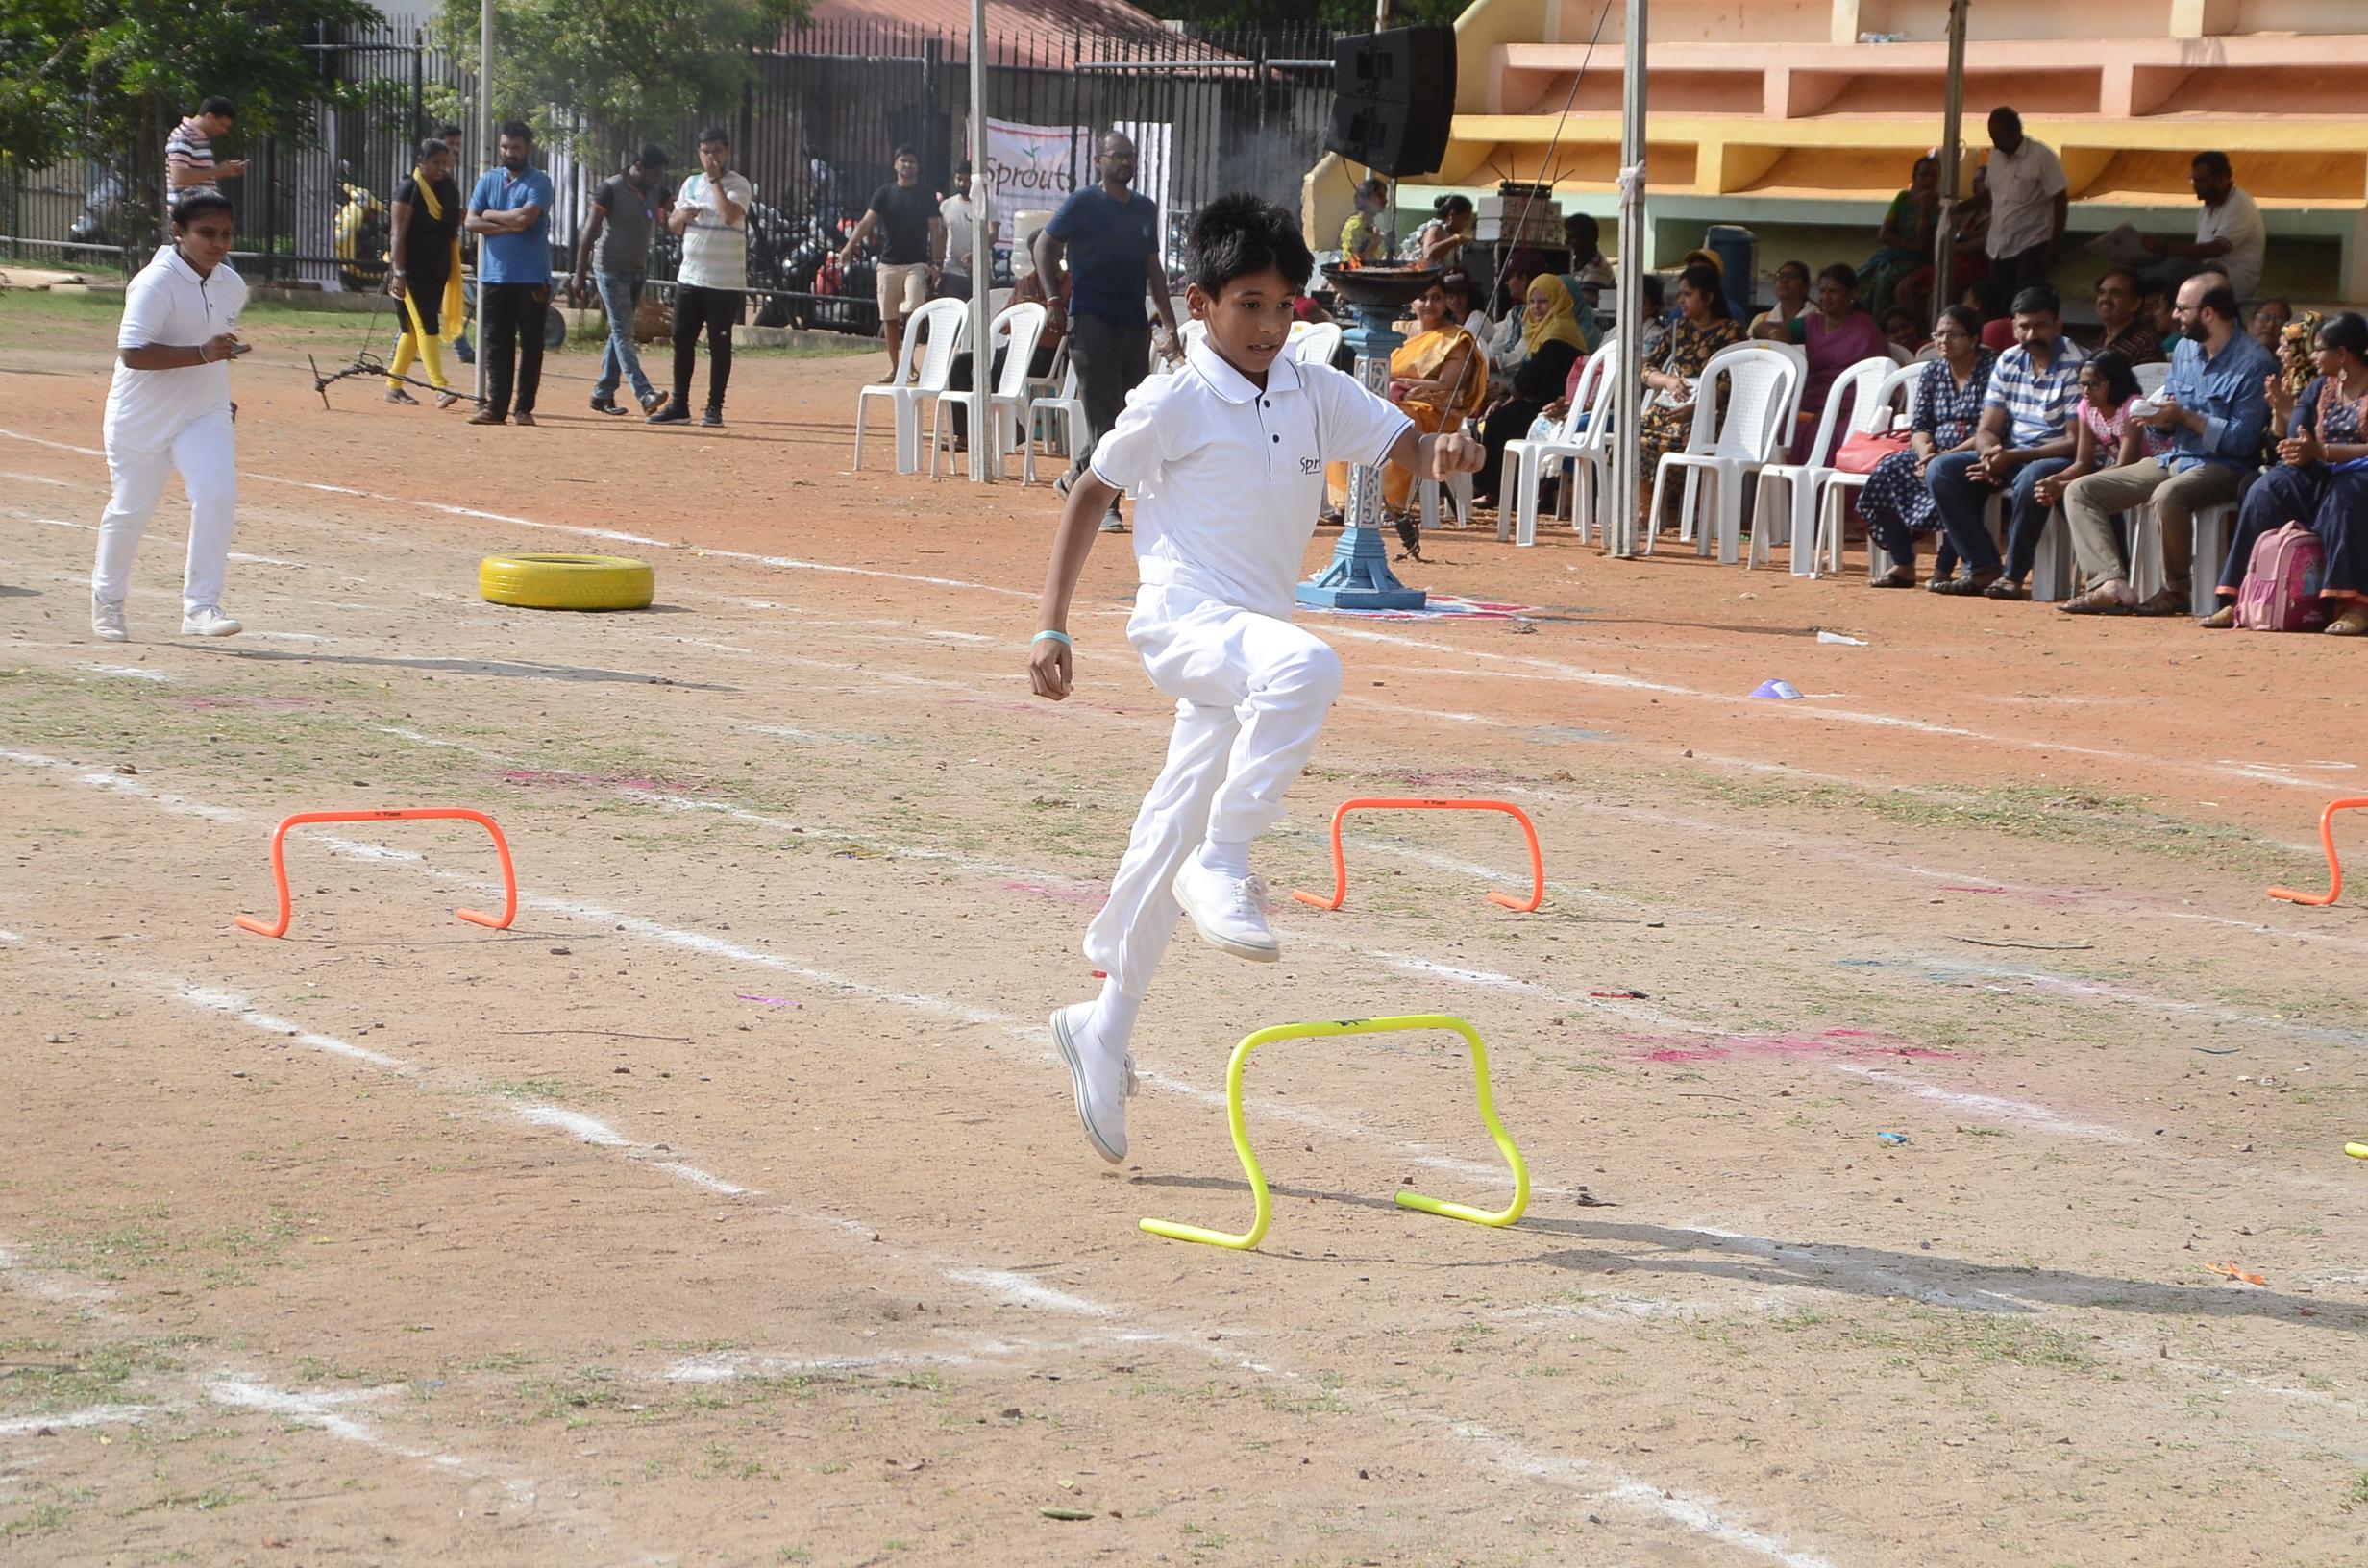 Jumping across hurdles